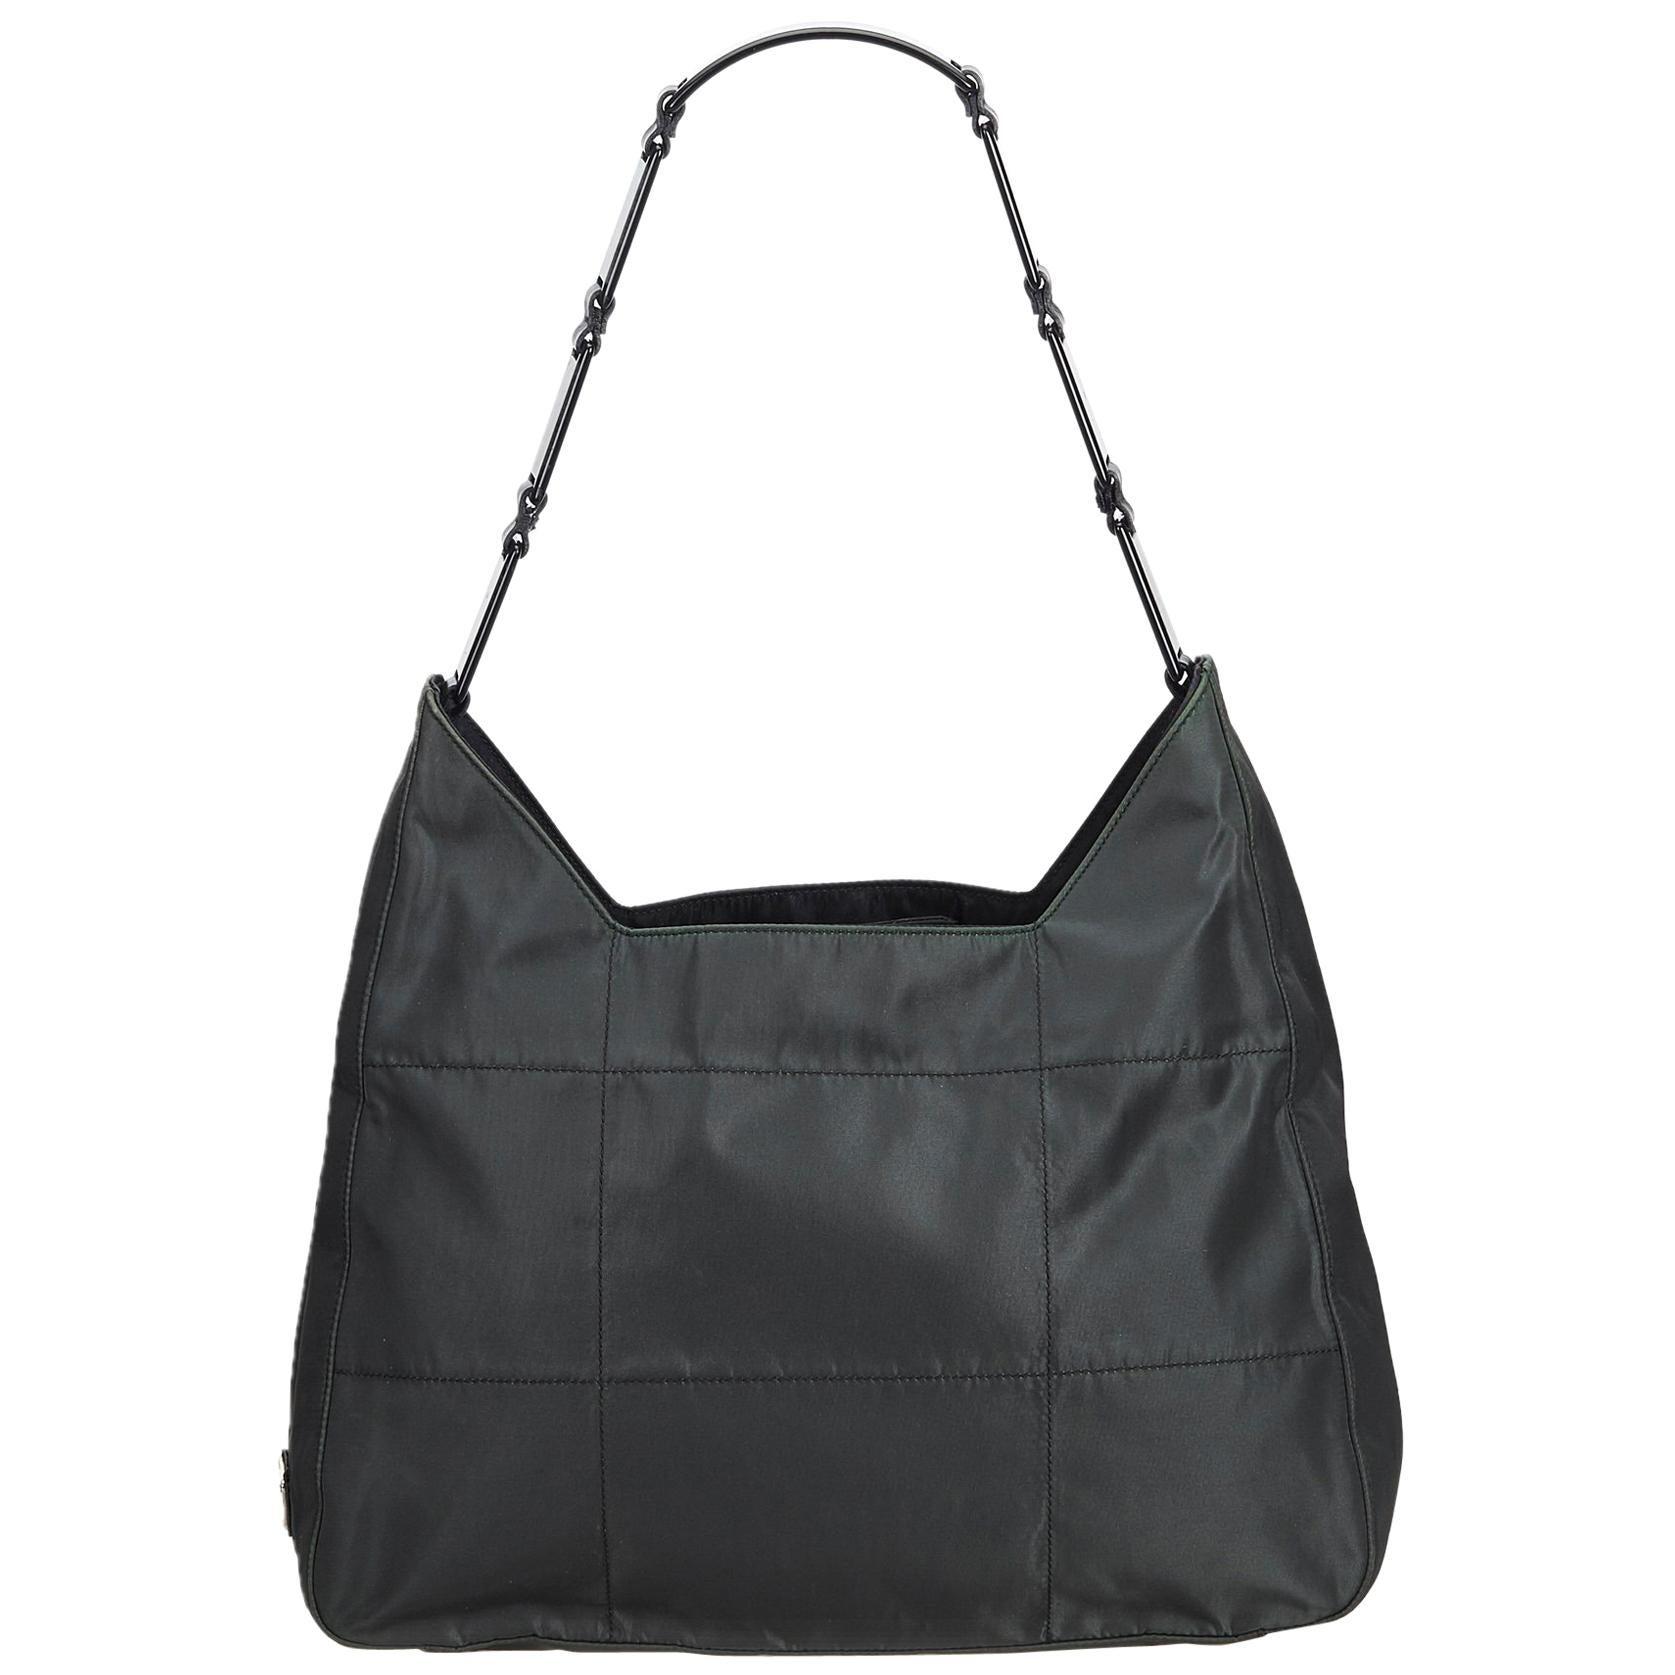 2151688577b577 Vintage Prada: Bags, Shoes, Dresses & More - 2,001 For Sale at 1stdibs